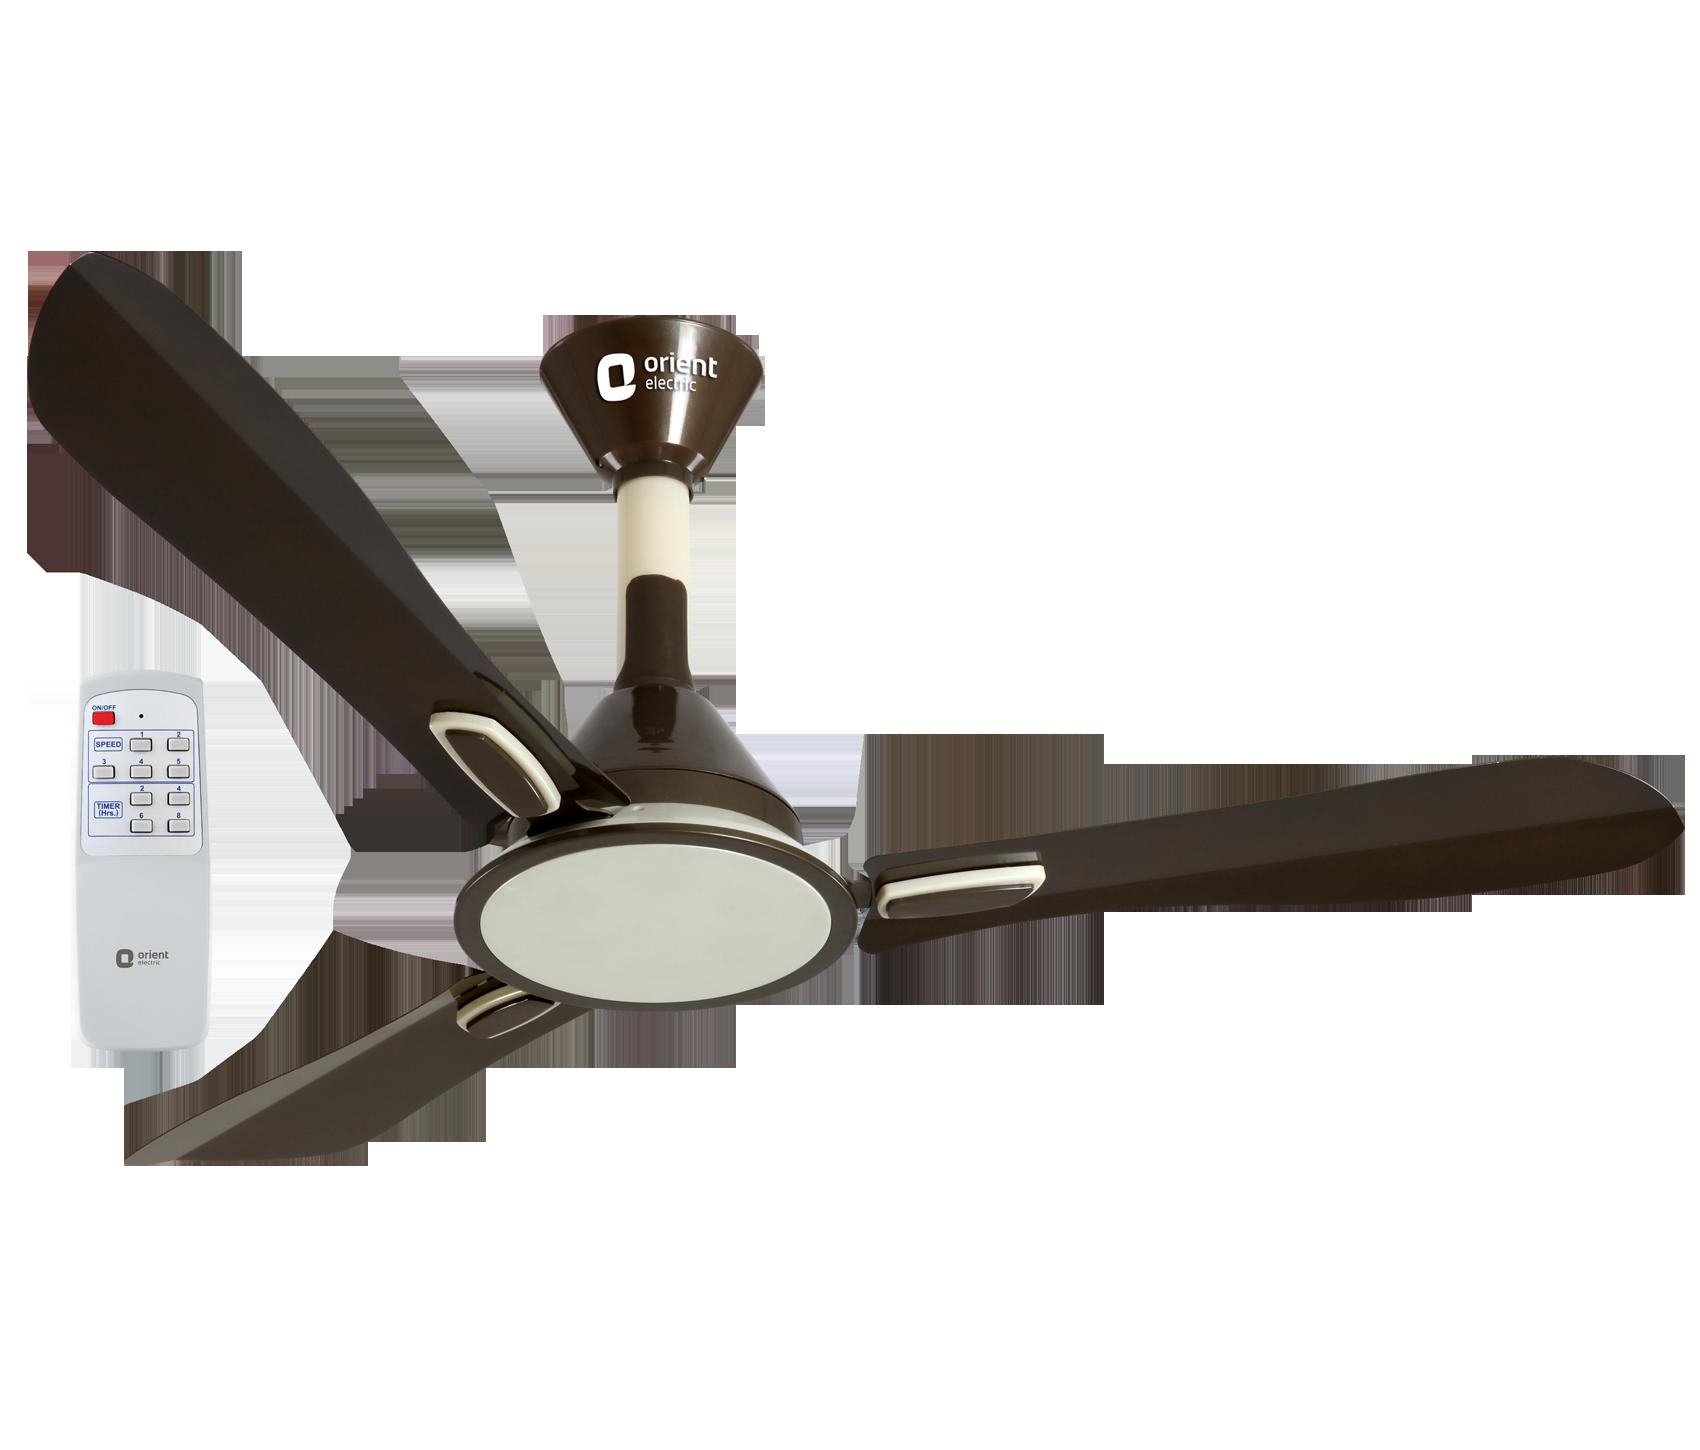 Orient - Sme information about best cieling fan ...